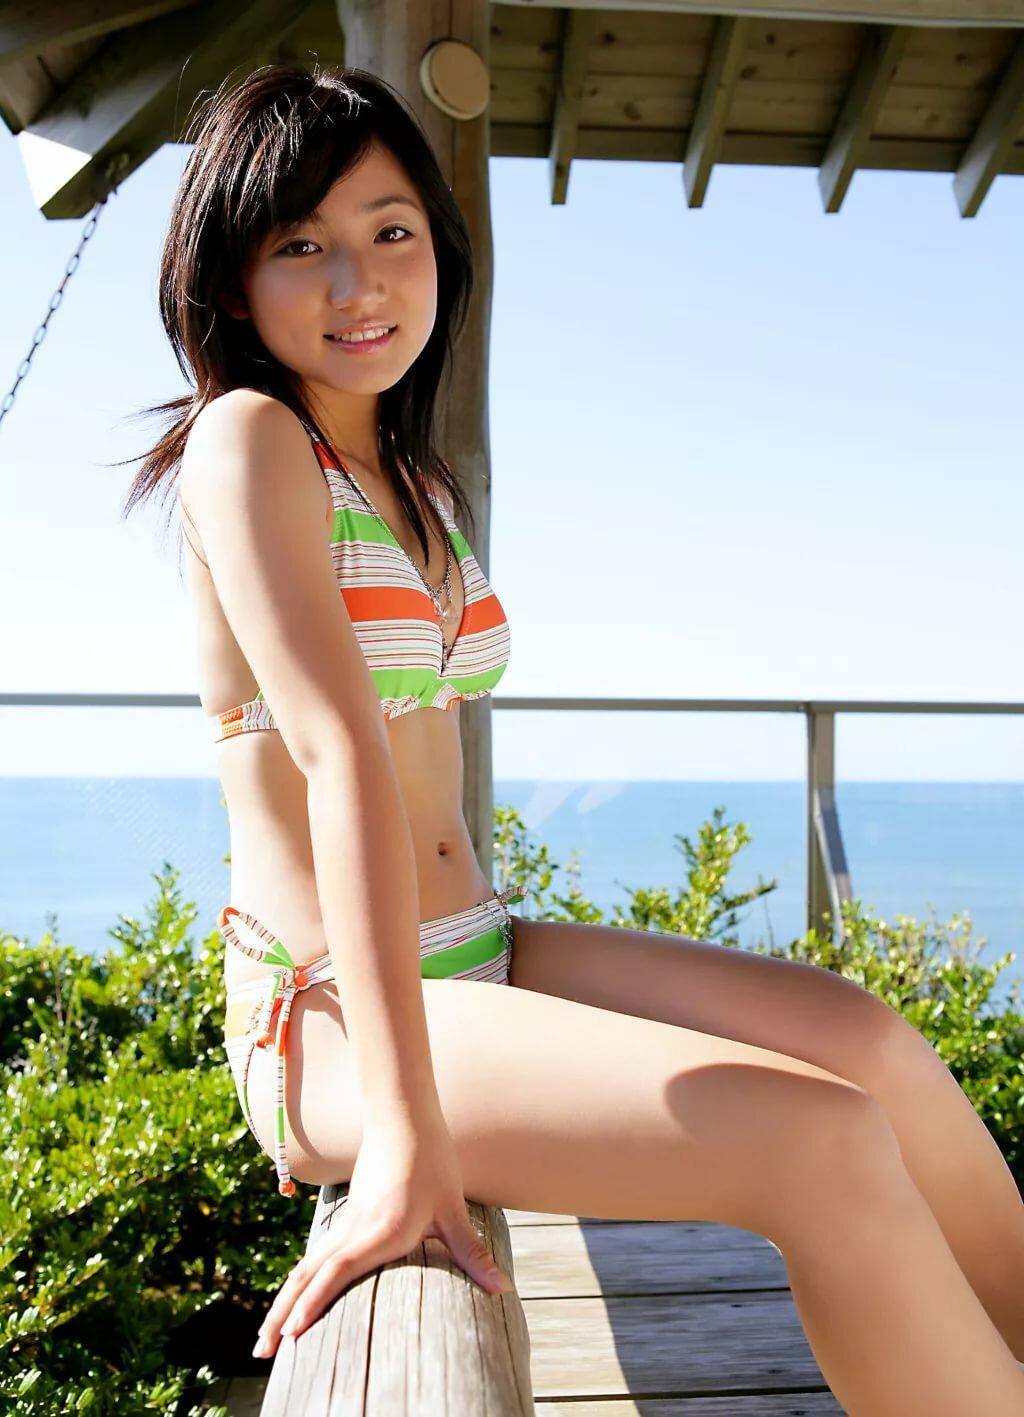 Young Petite Asian